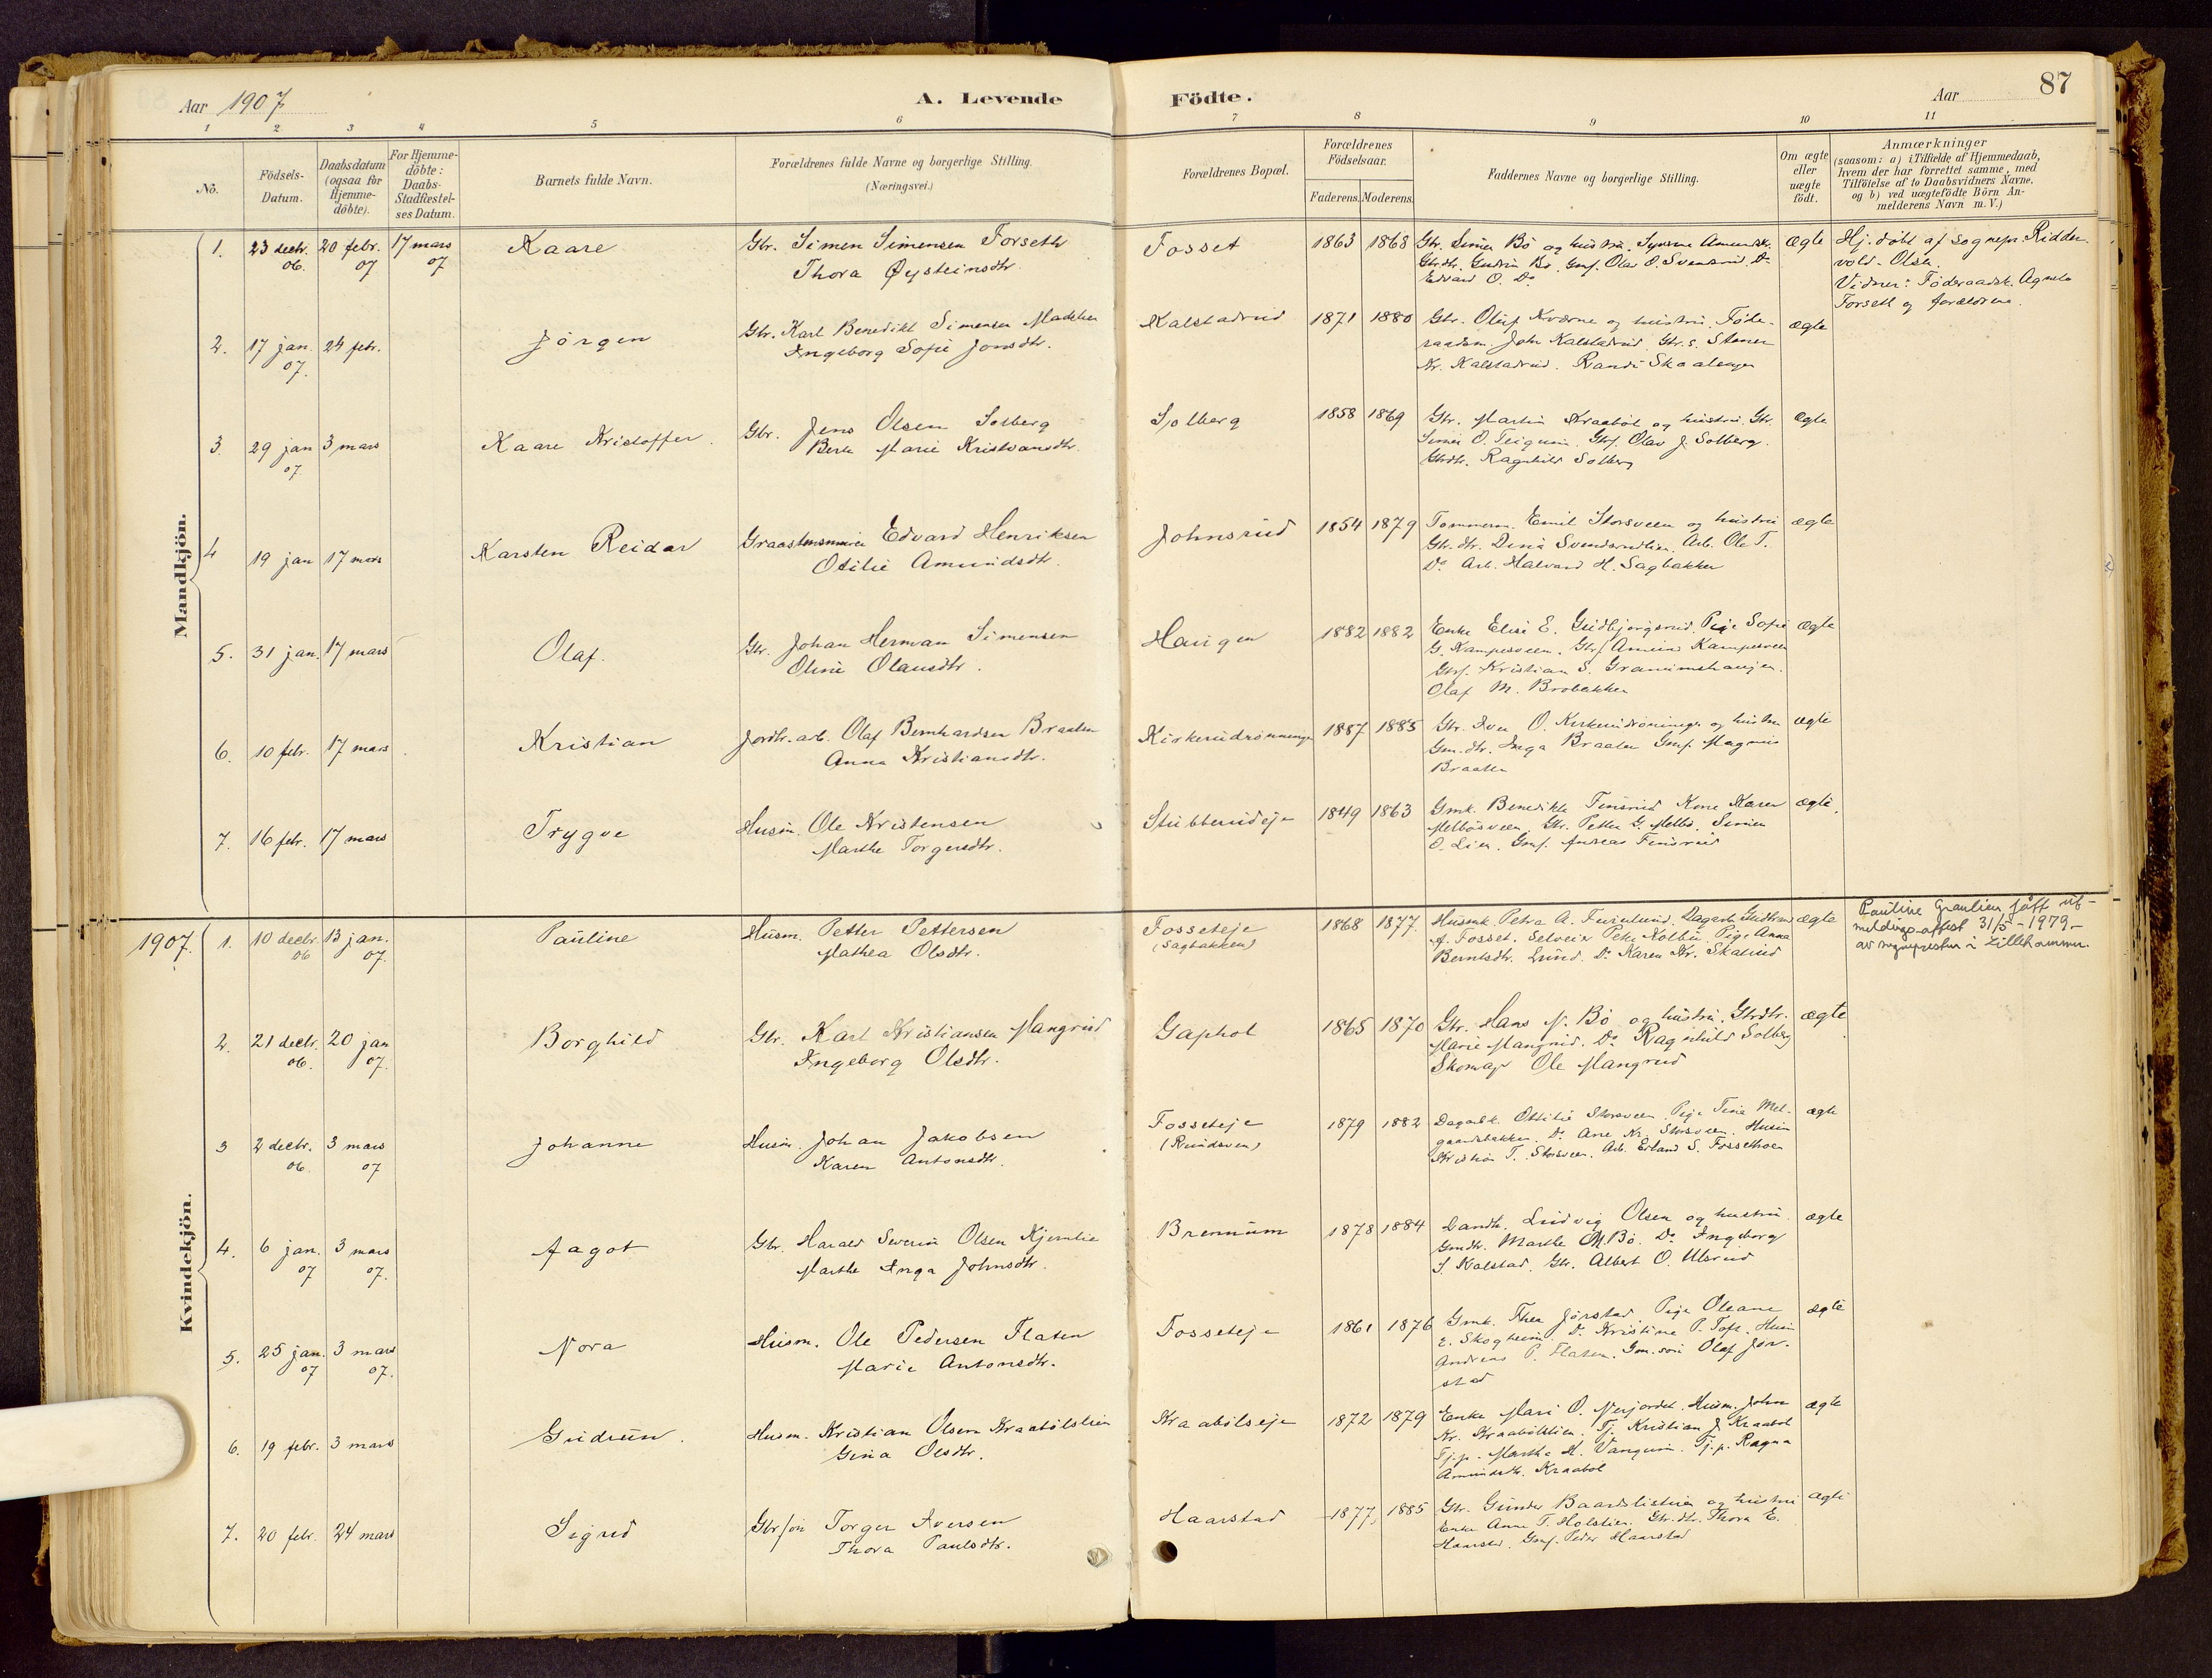 SAH, Vestre Gausdal prestekontor, Ministerialbok nr. 1, 1887-1914, s. 87